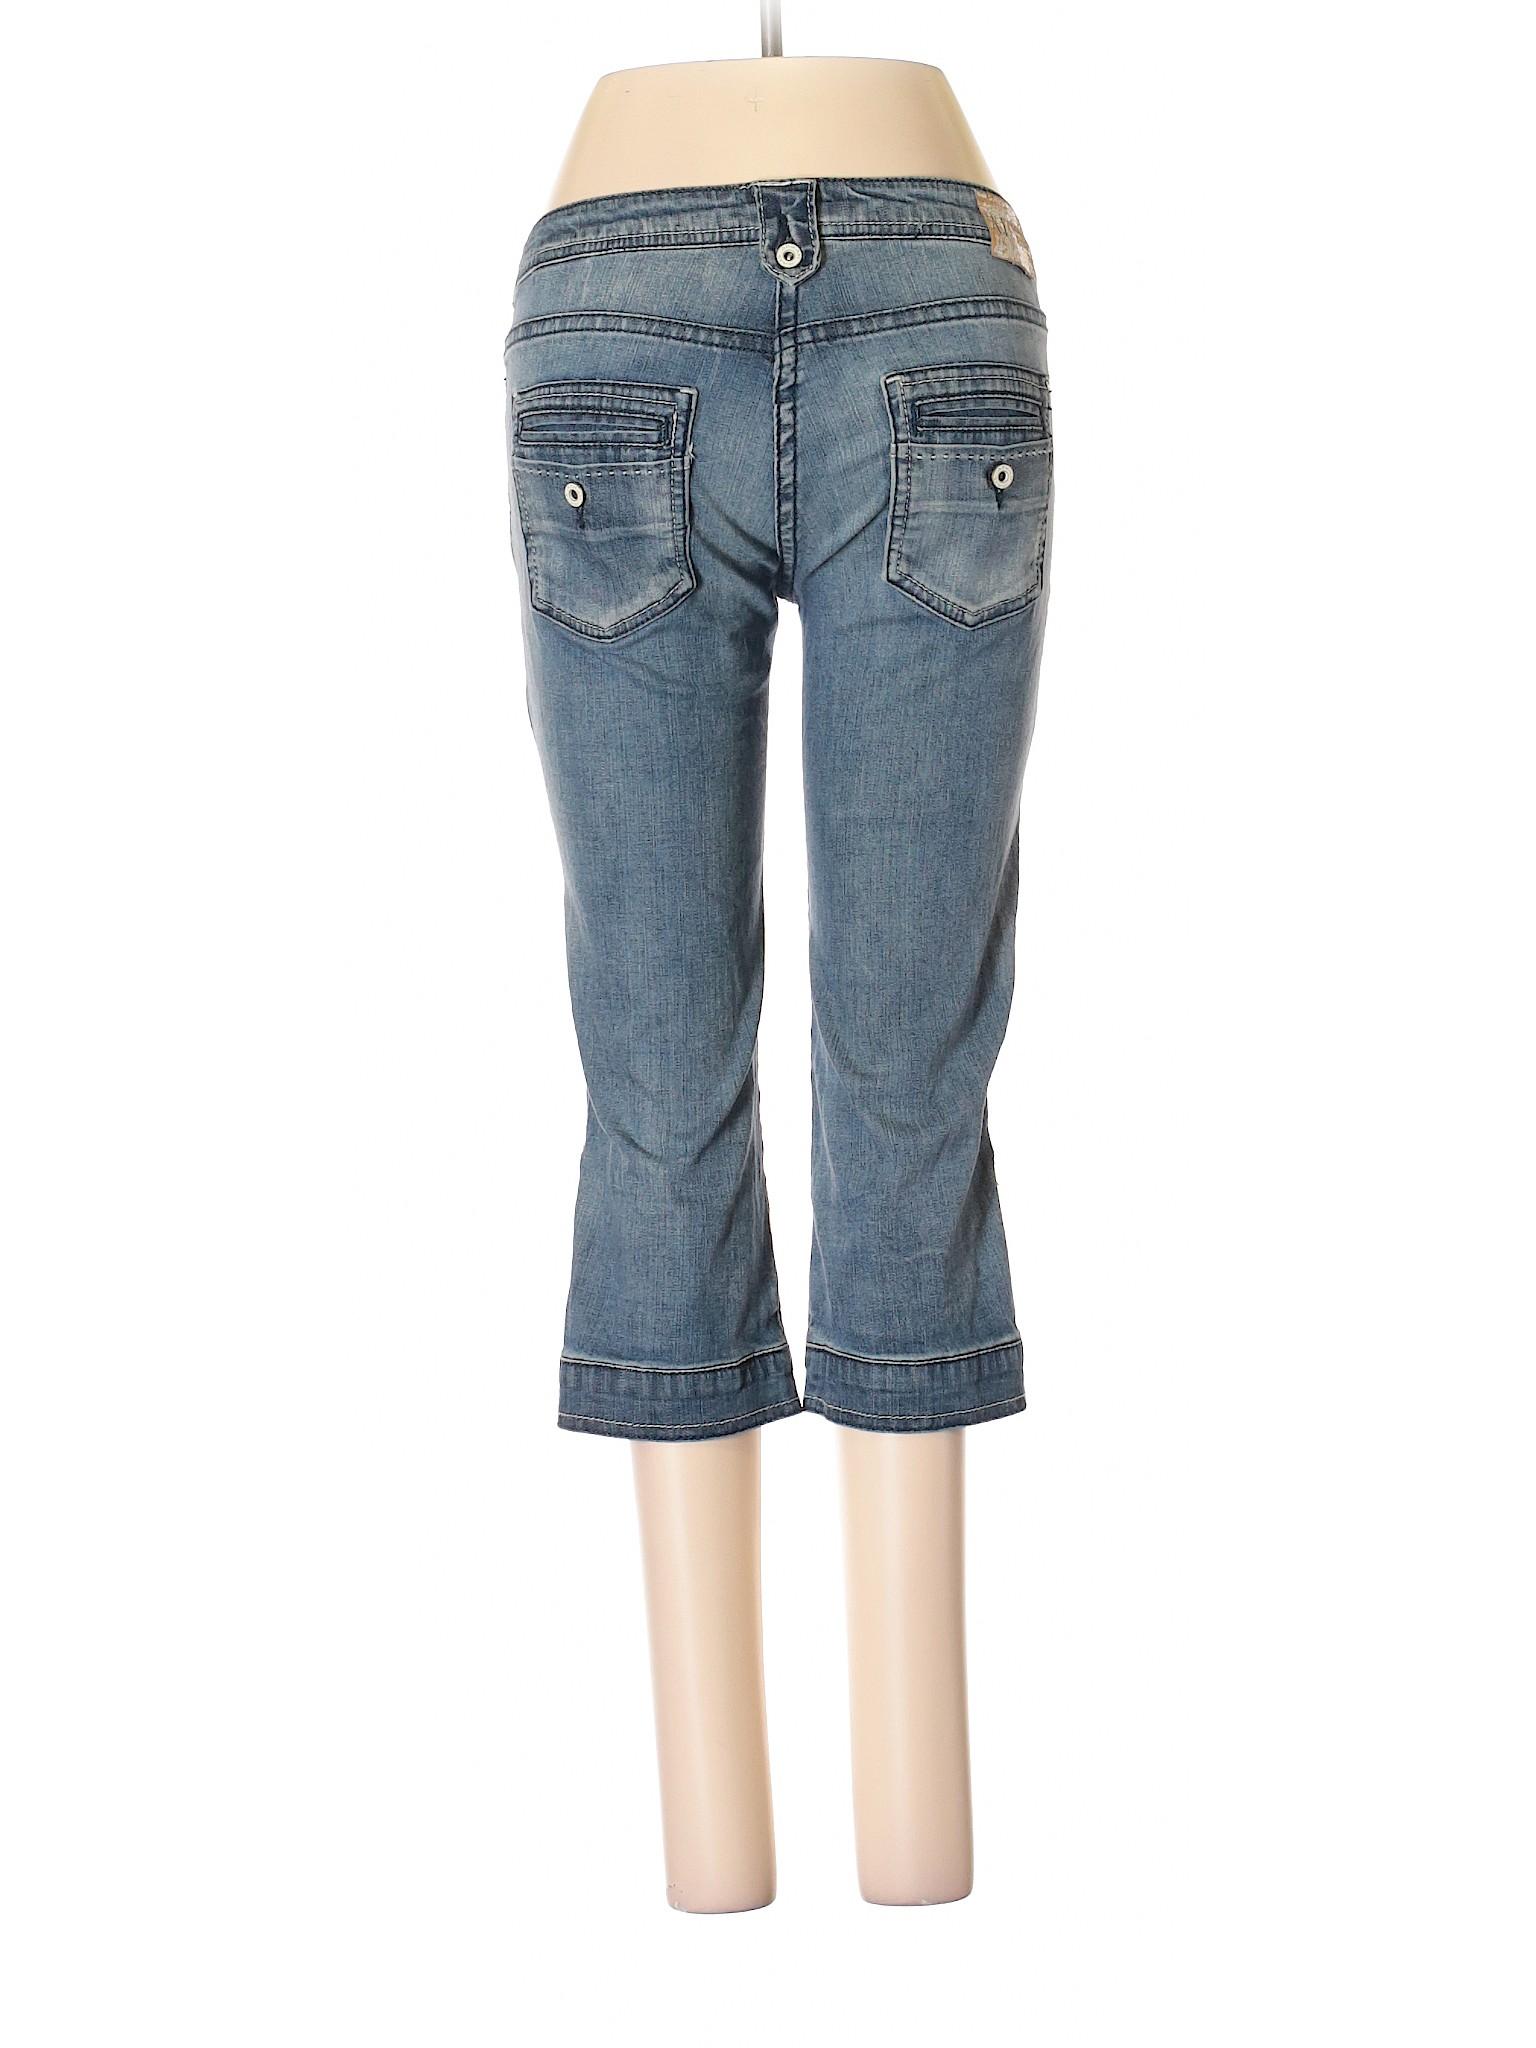 Promotion Promotion Armani Jeans Armani Promotion Promotion Jeans Armani Armani Promotion Jeans Armani Jeans qpnWx7RY